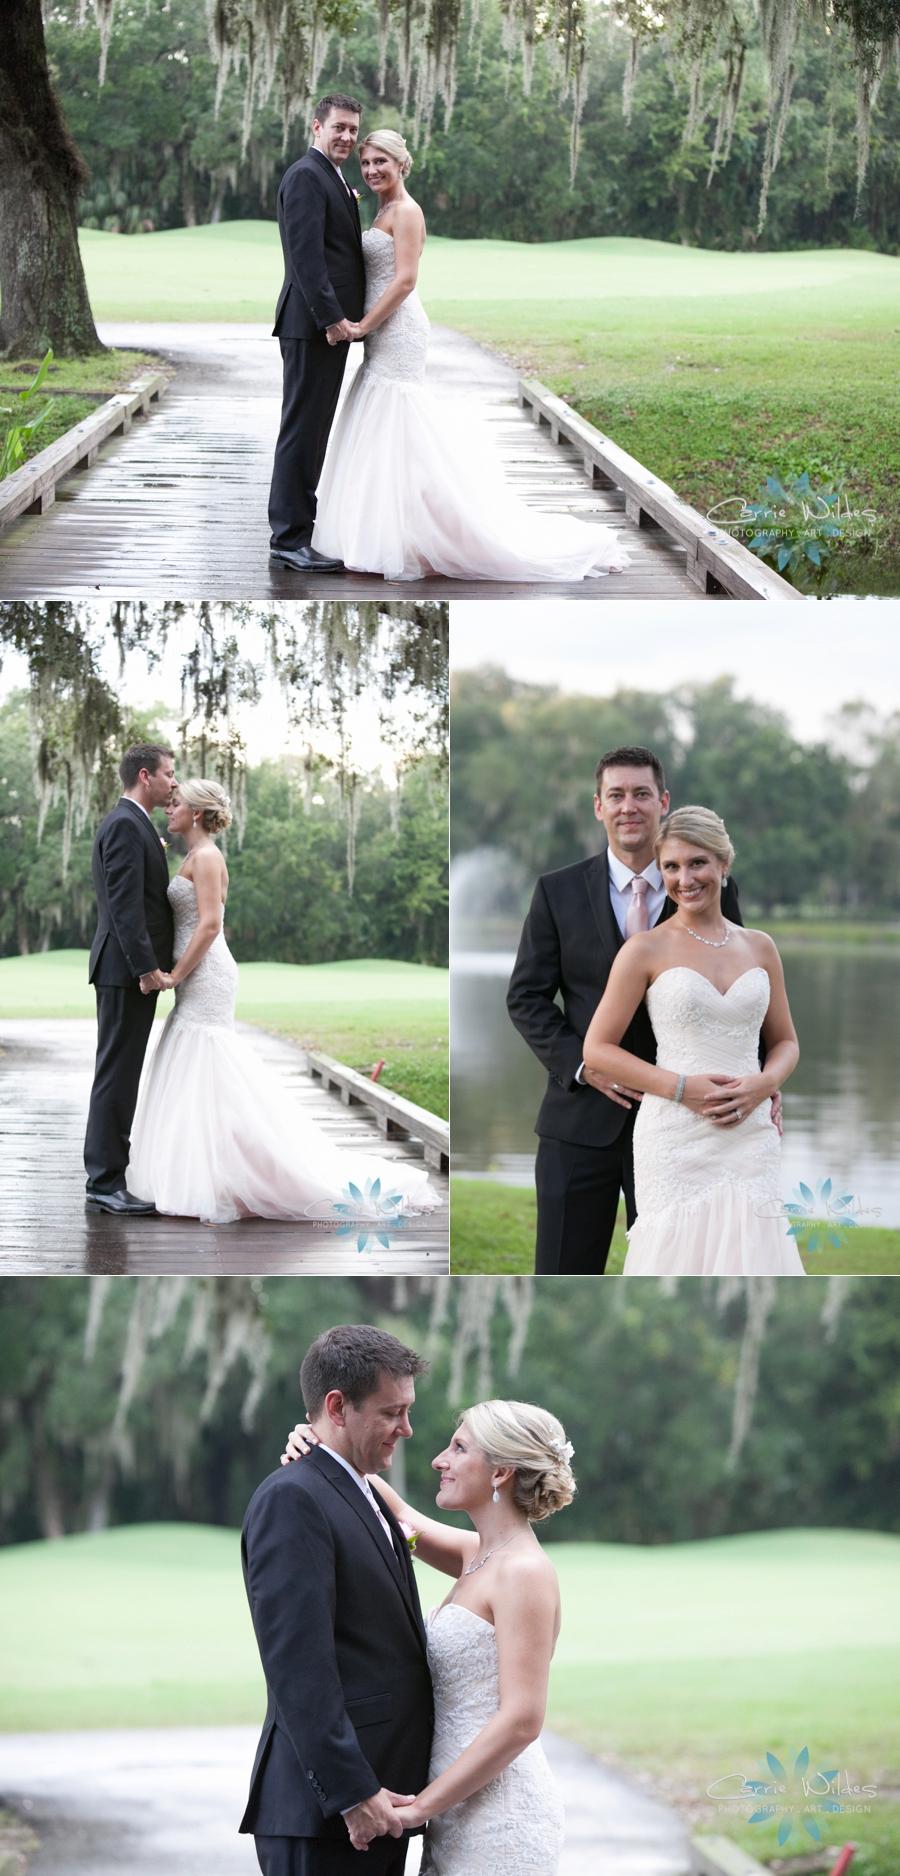 9_26_15 Tampa Palms Country Club Wedding_0053.jpg